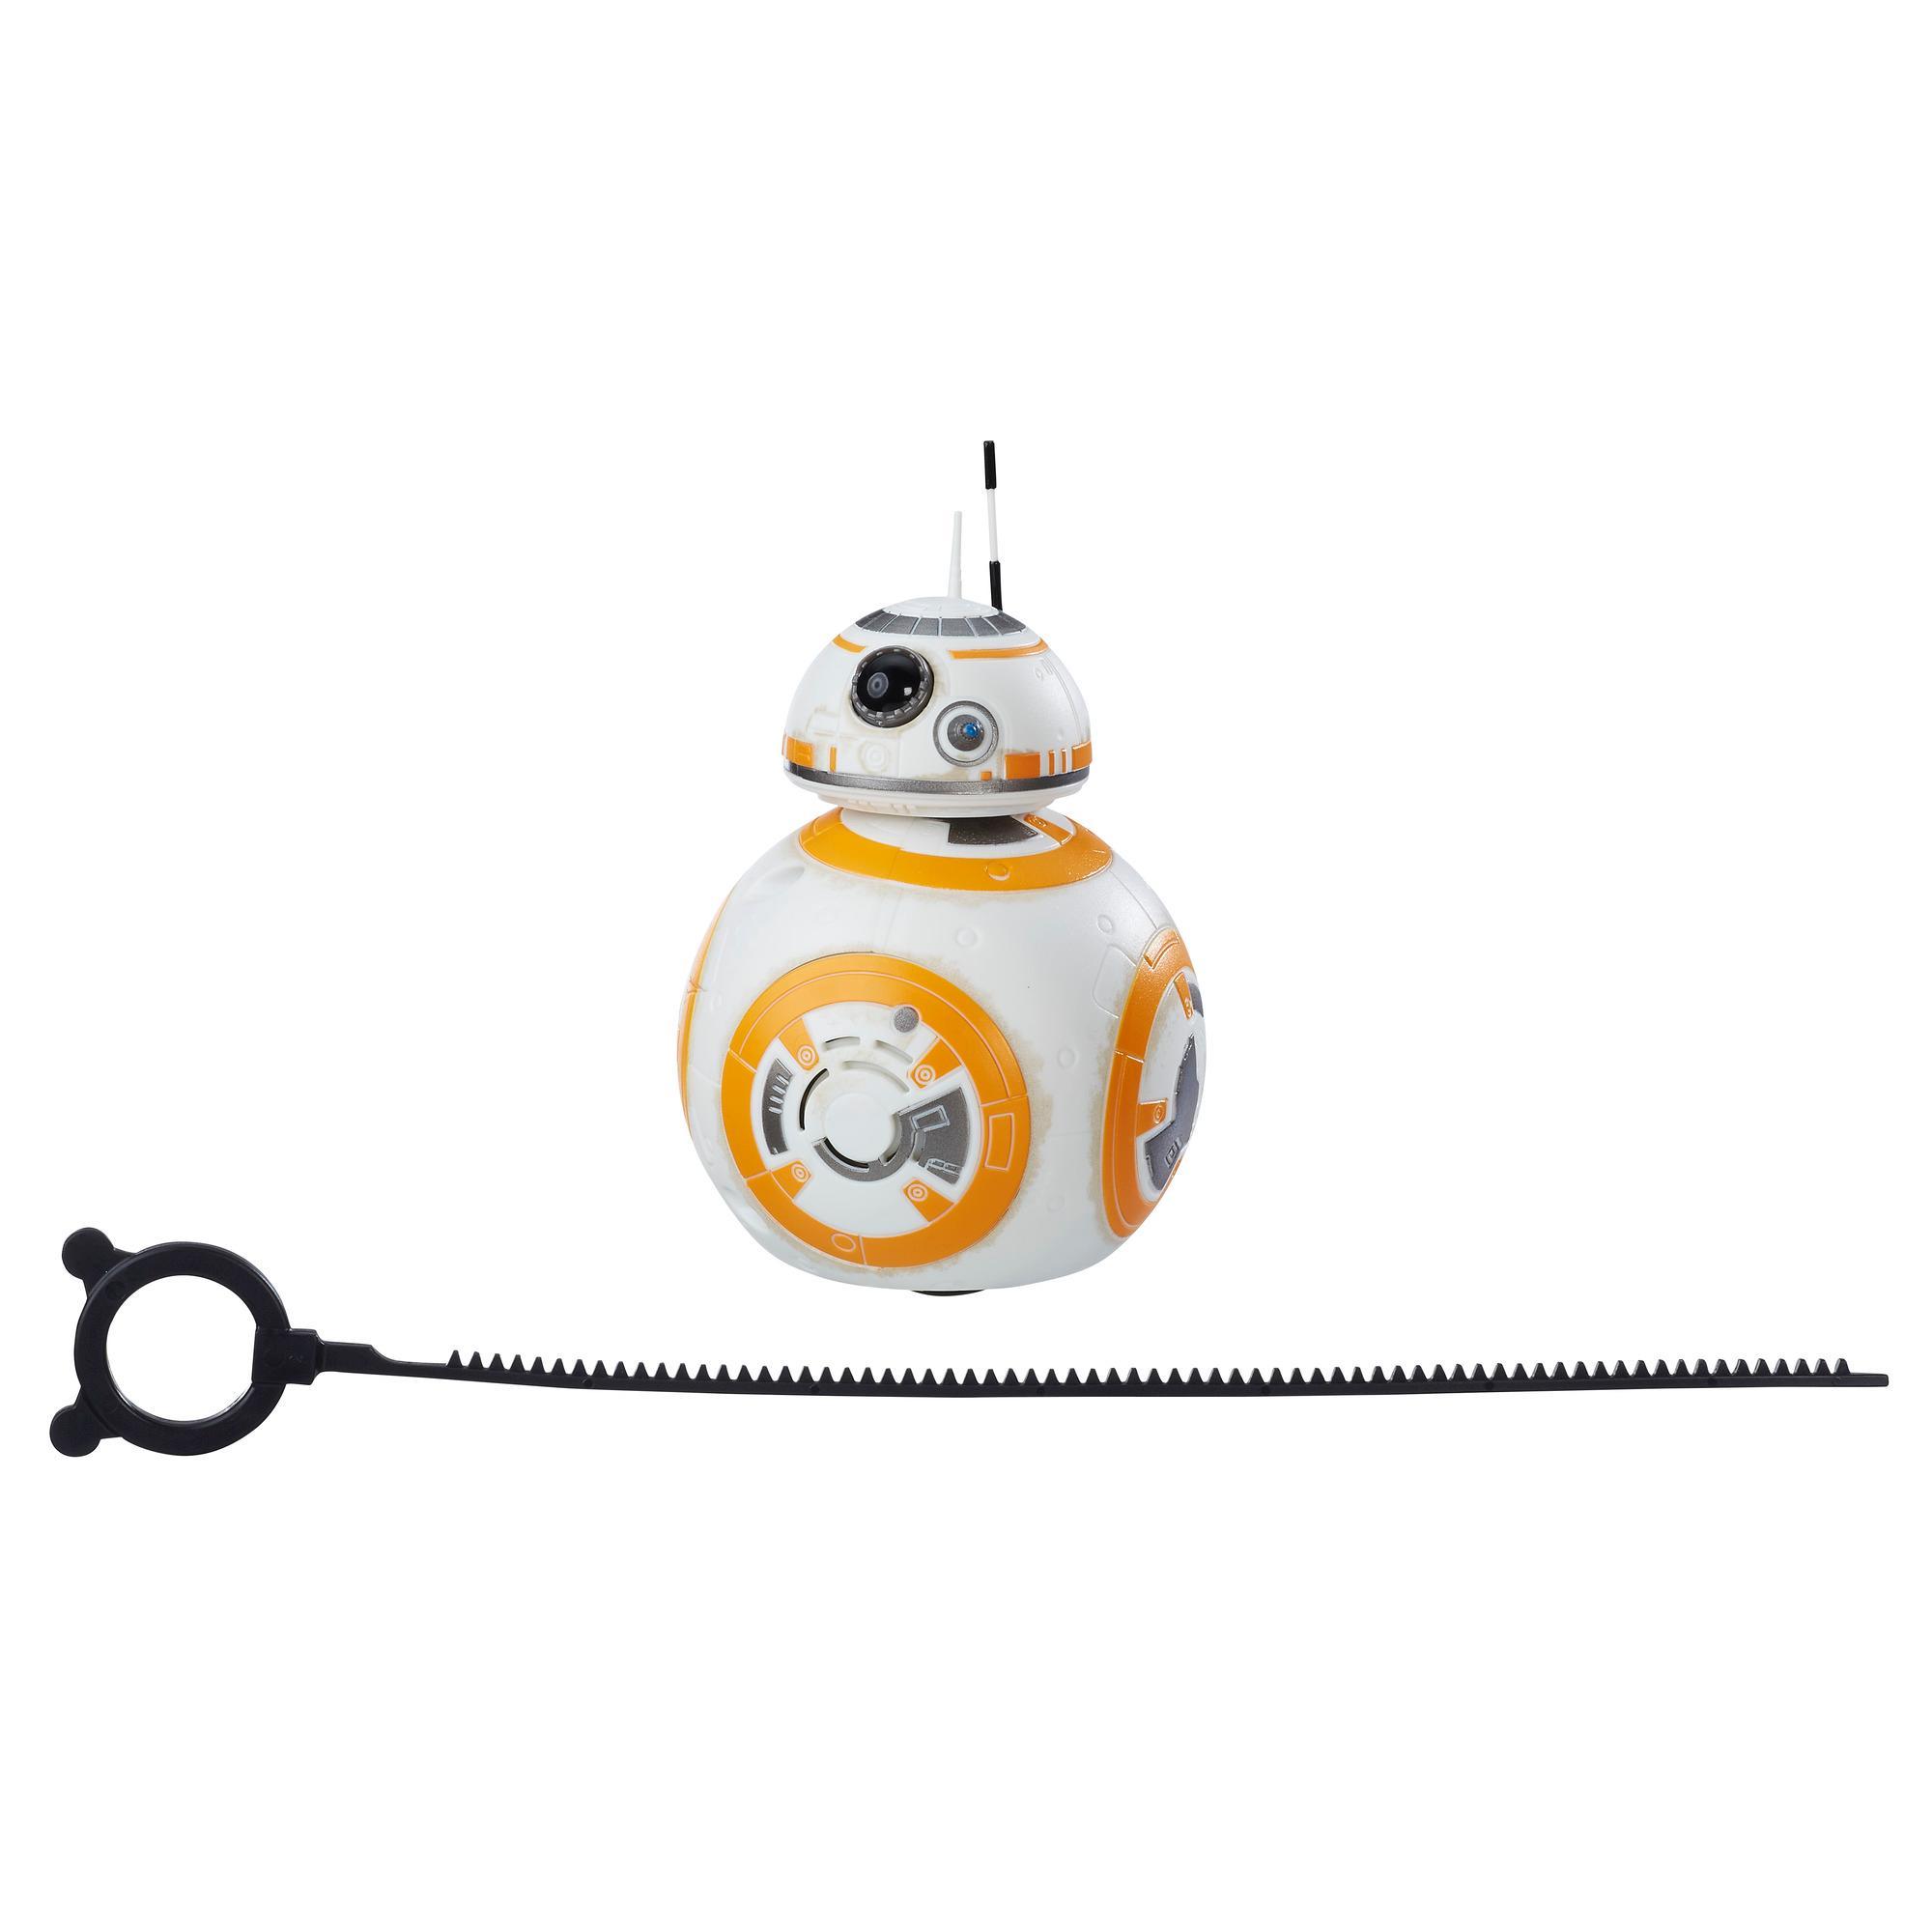 Star Wars - BB-8 A propulsión